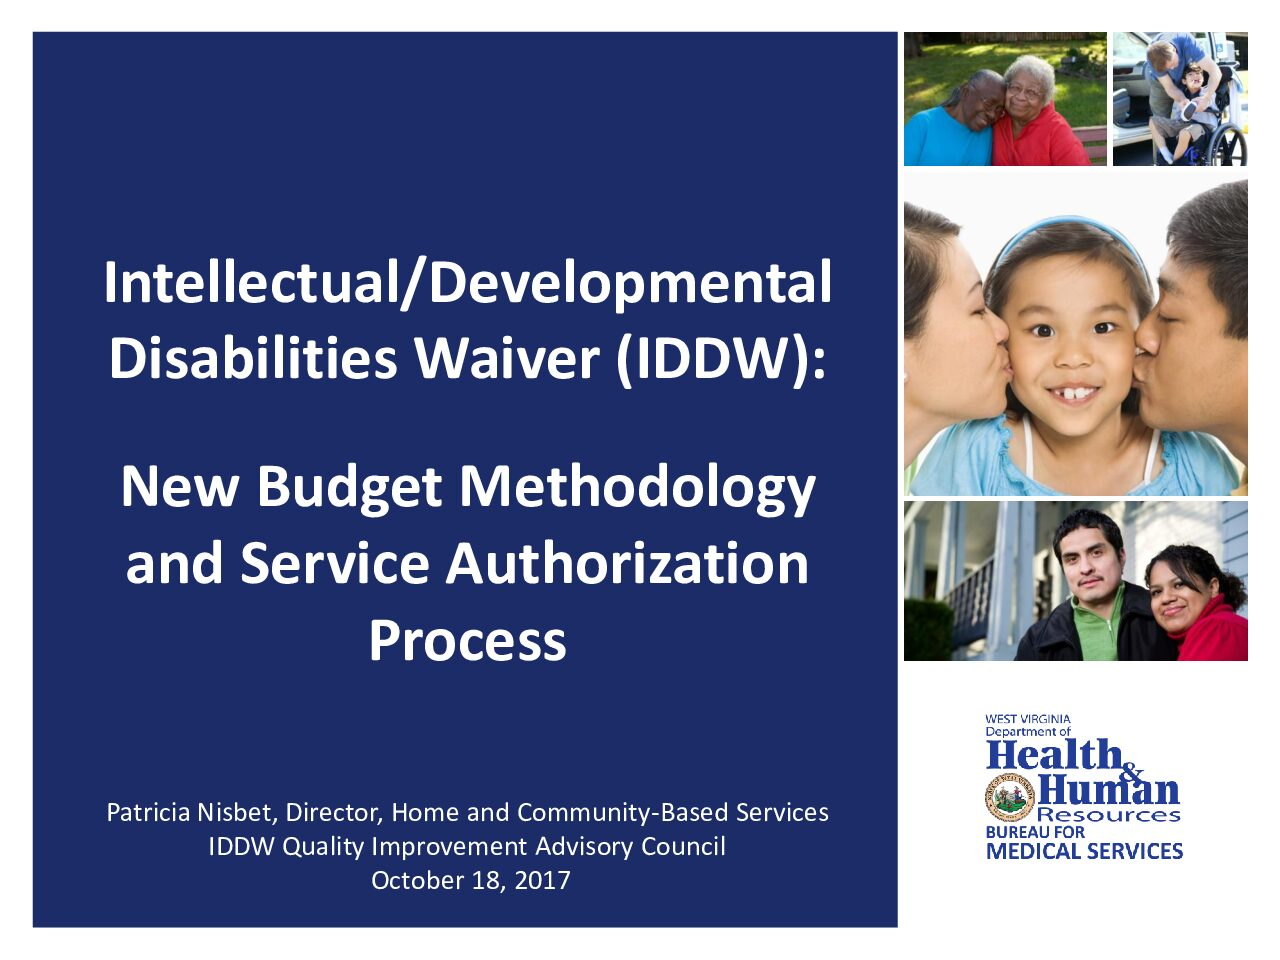 Intellectual/DevelopmentalDisabilities Waiver (IDDW): New Budget Methodology and Service Authorization Process